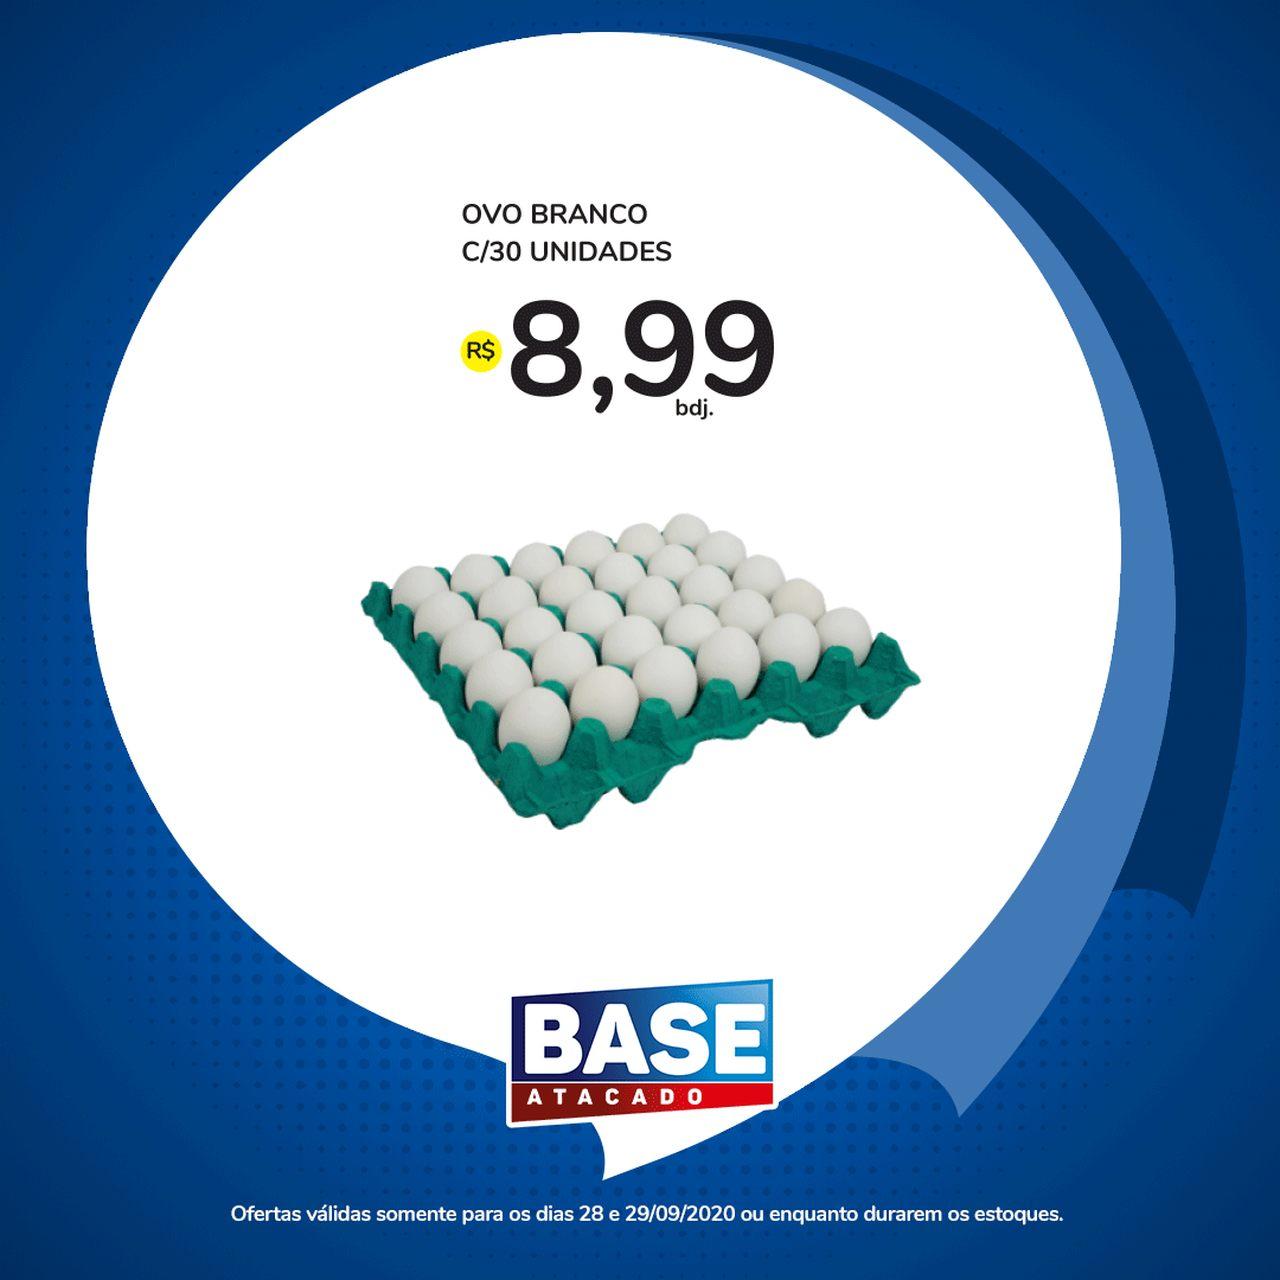 Ofertas de supermercado BASE atacado segunda e terça de super ofertas vence 29-09-8